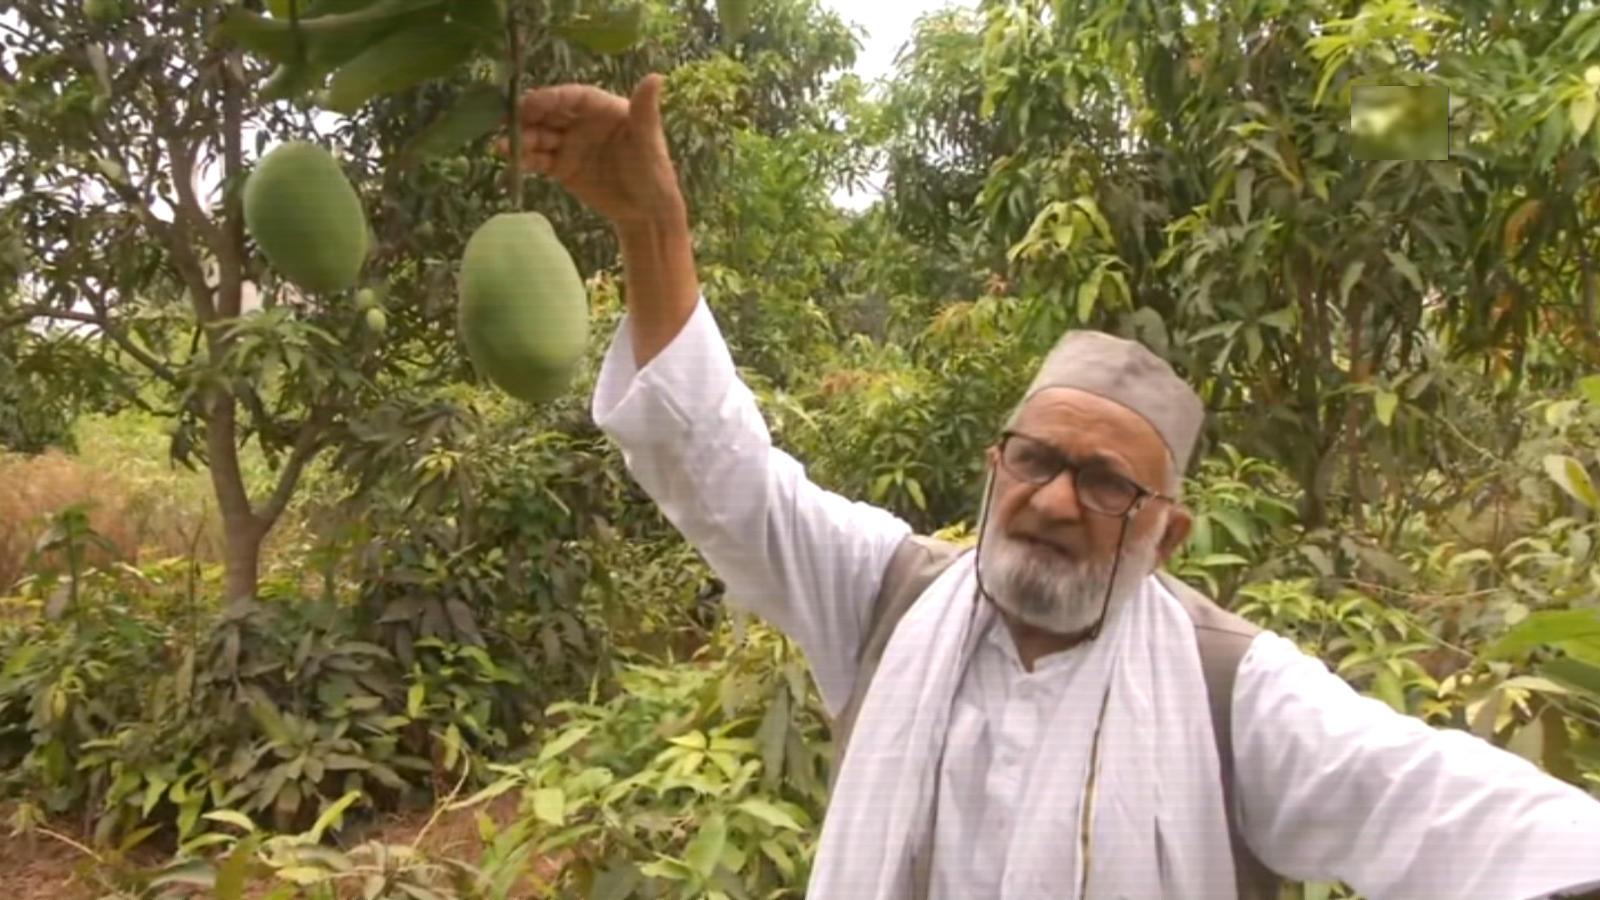 mango-man-grows-new-variety-named-after-amit-shah